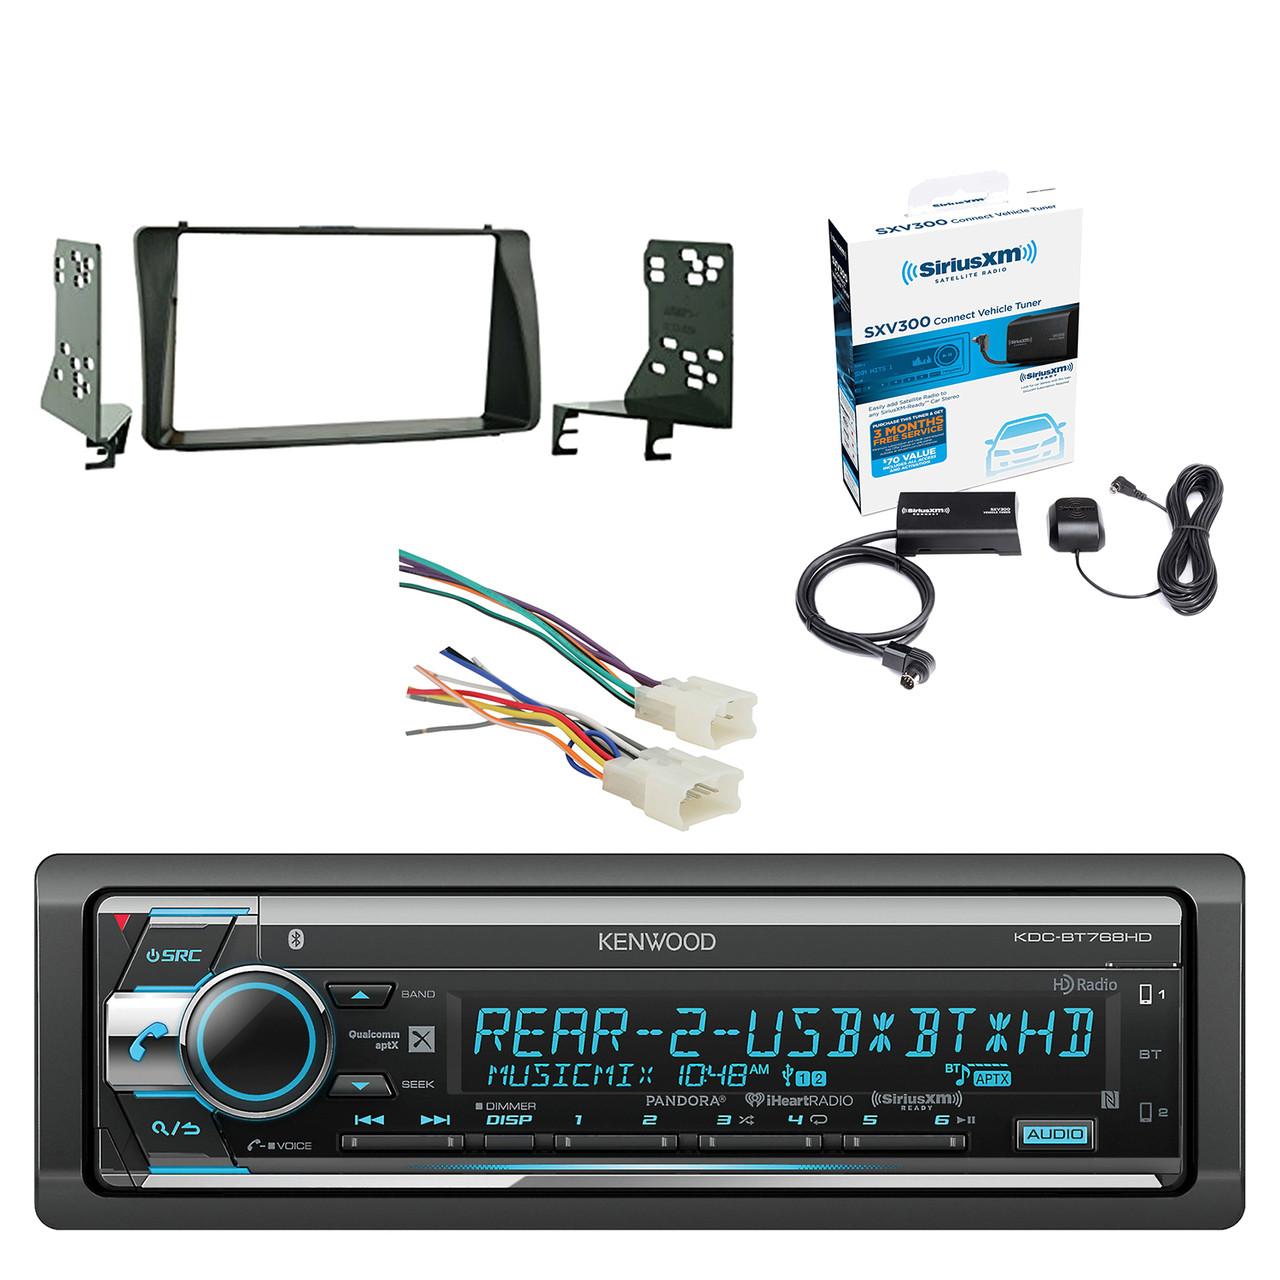 medium resolution of kenwood single din cd am fm car audio receiver with built in car radio receiver wiring